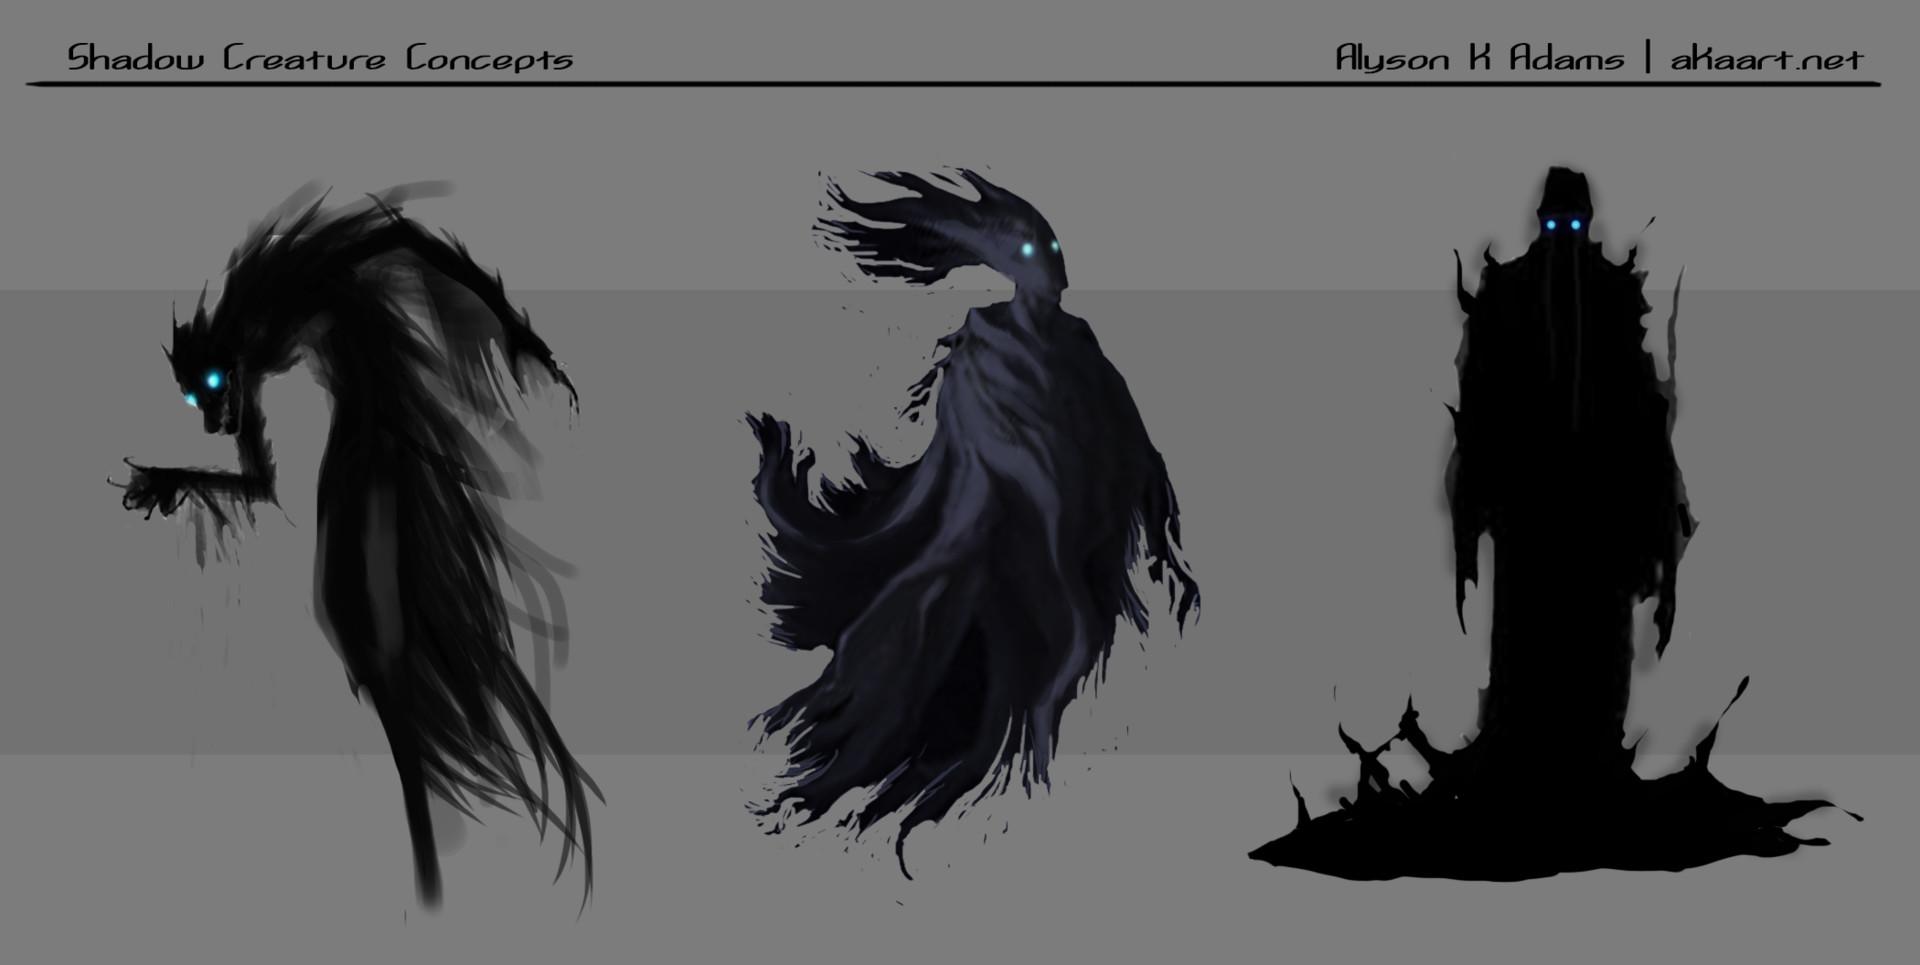 Alyson Adams Project Dose Creature Concepts